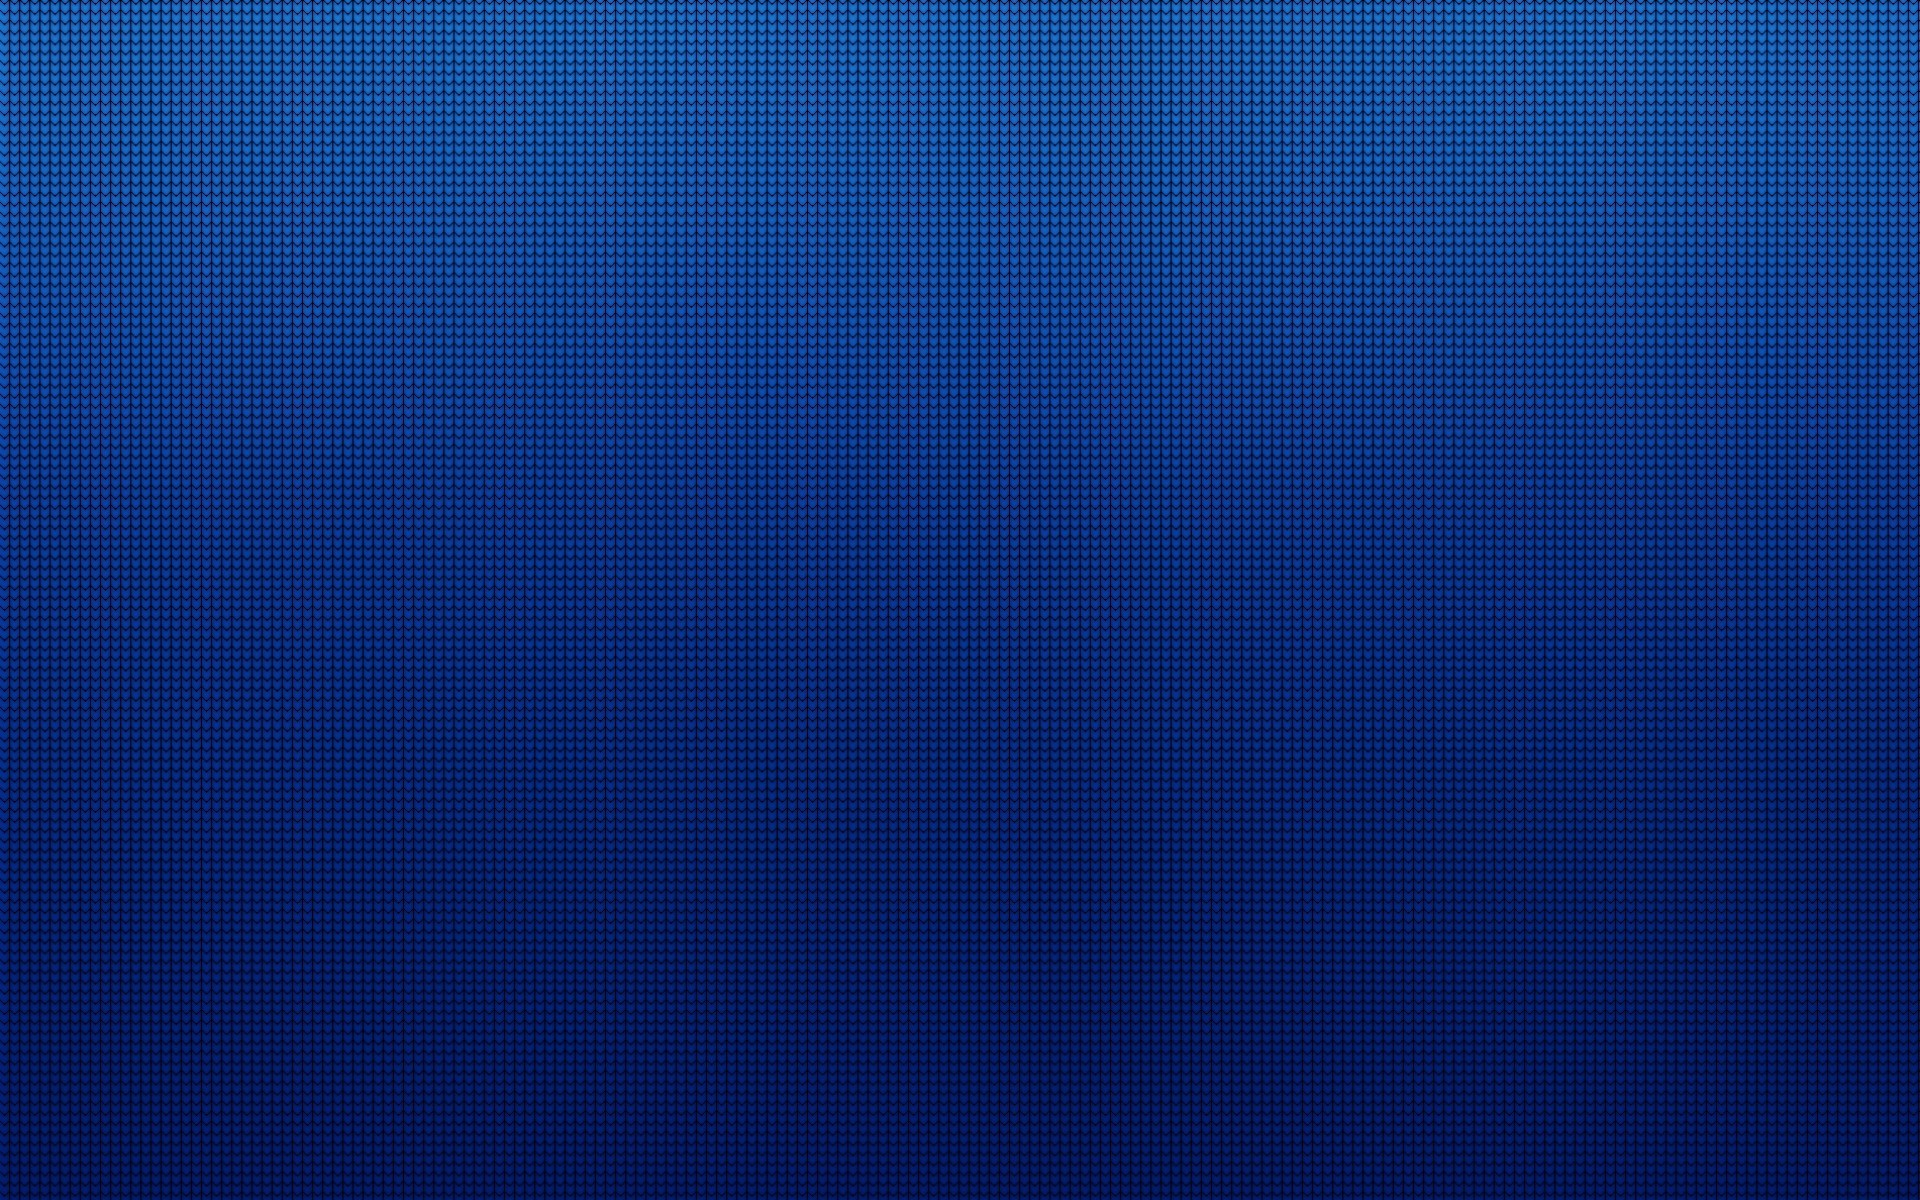 Dark Blue Background Images